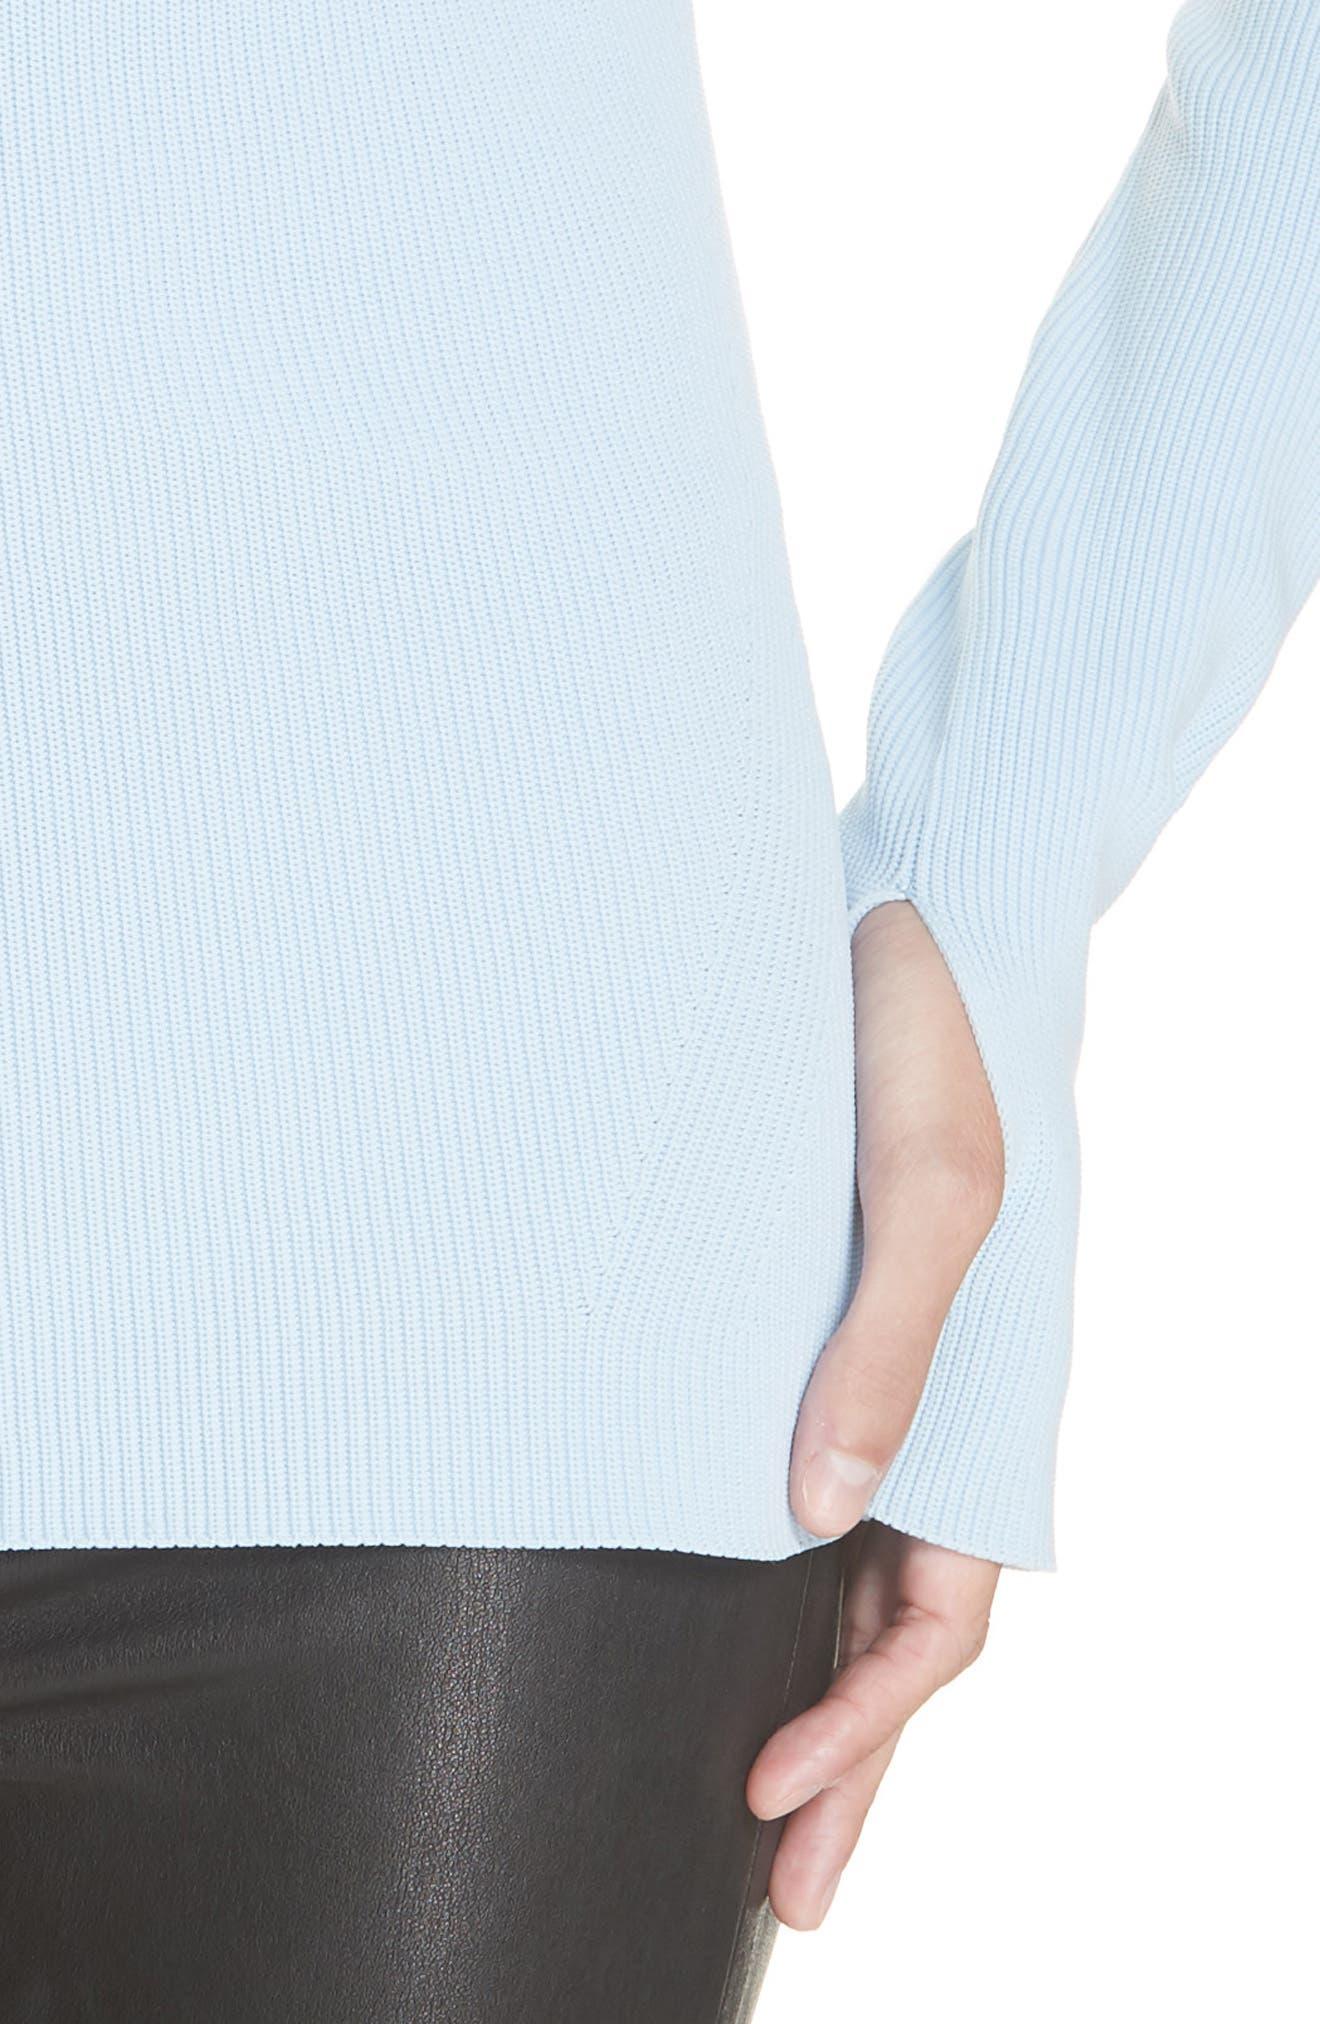 HELMUT LANG, Crewneck Sweater, Alternate thumbnail 4, color, LIGHT WAVE